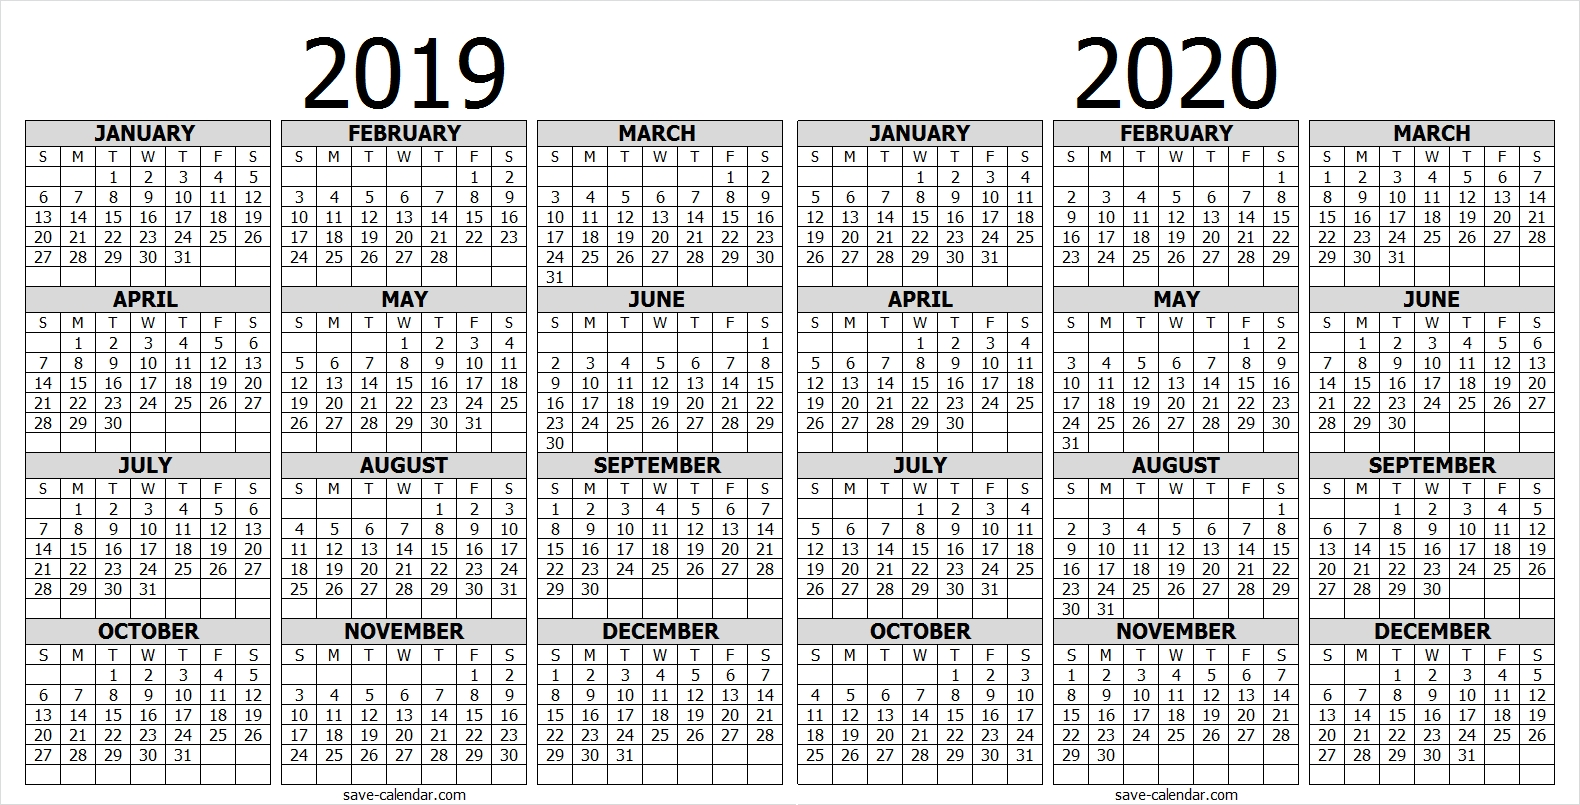 Calendar 2019 2020 One Page | 2019 Calendar | Free Calendar in Edit Free Calendar Template 2019-2020